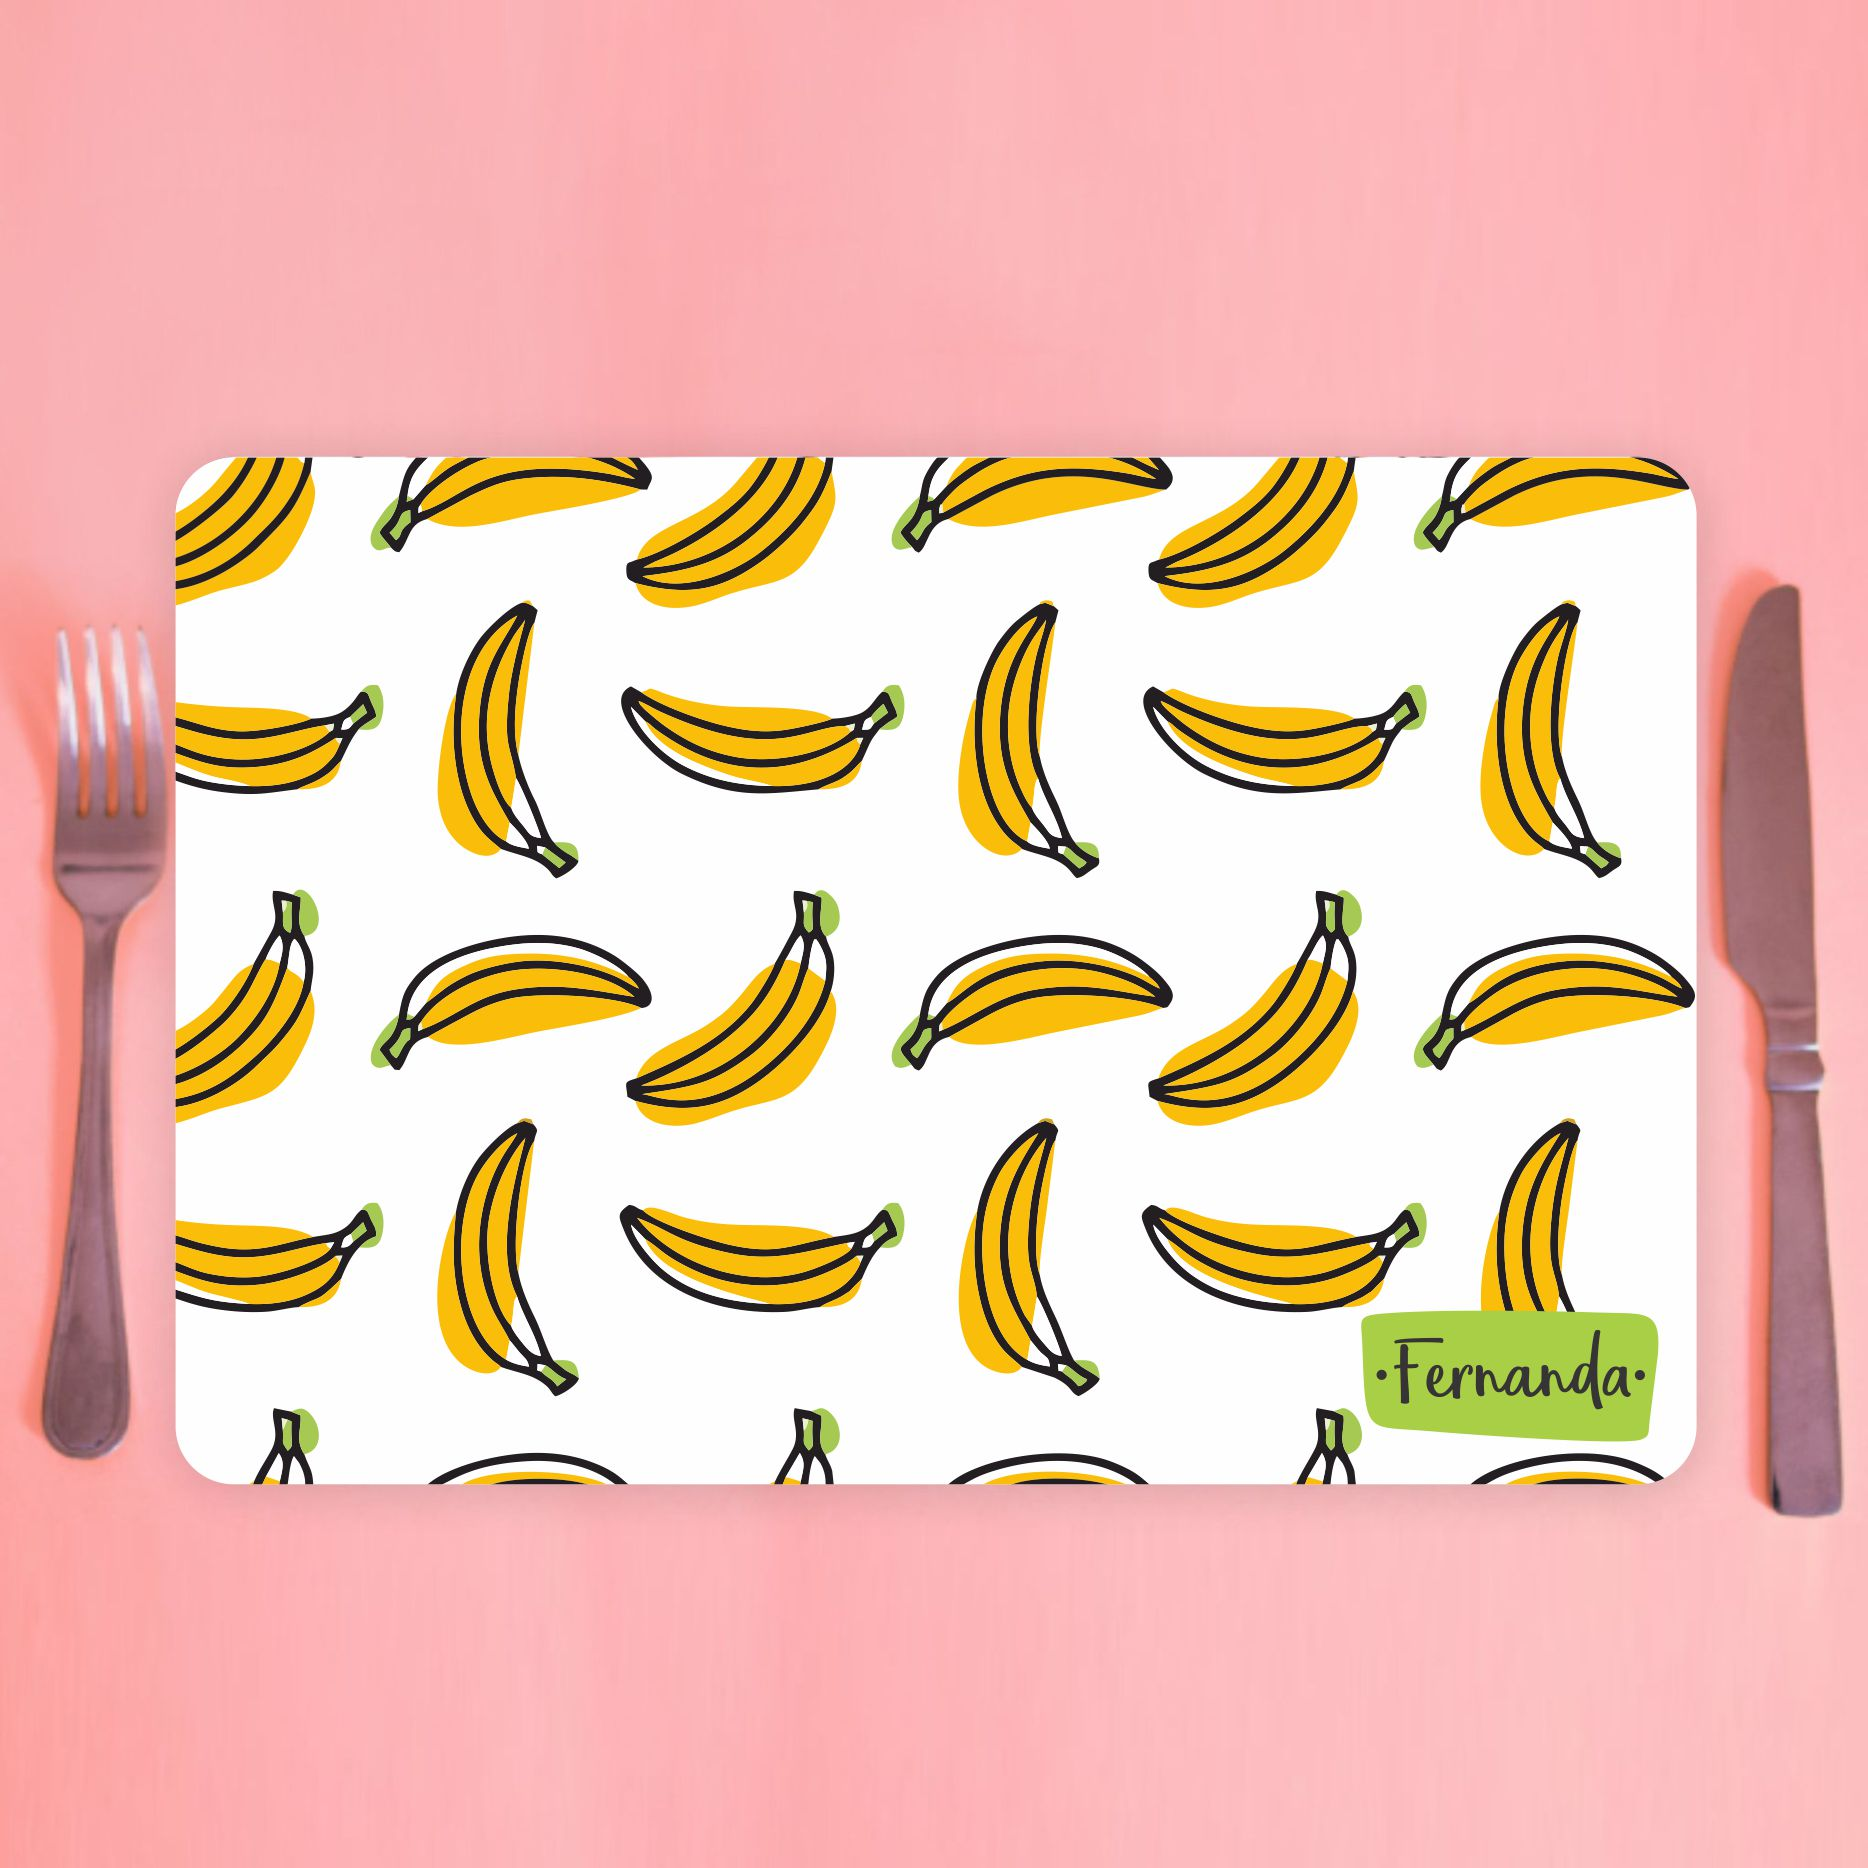 Jogo Americano Personalizado - bananas